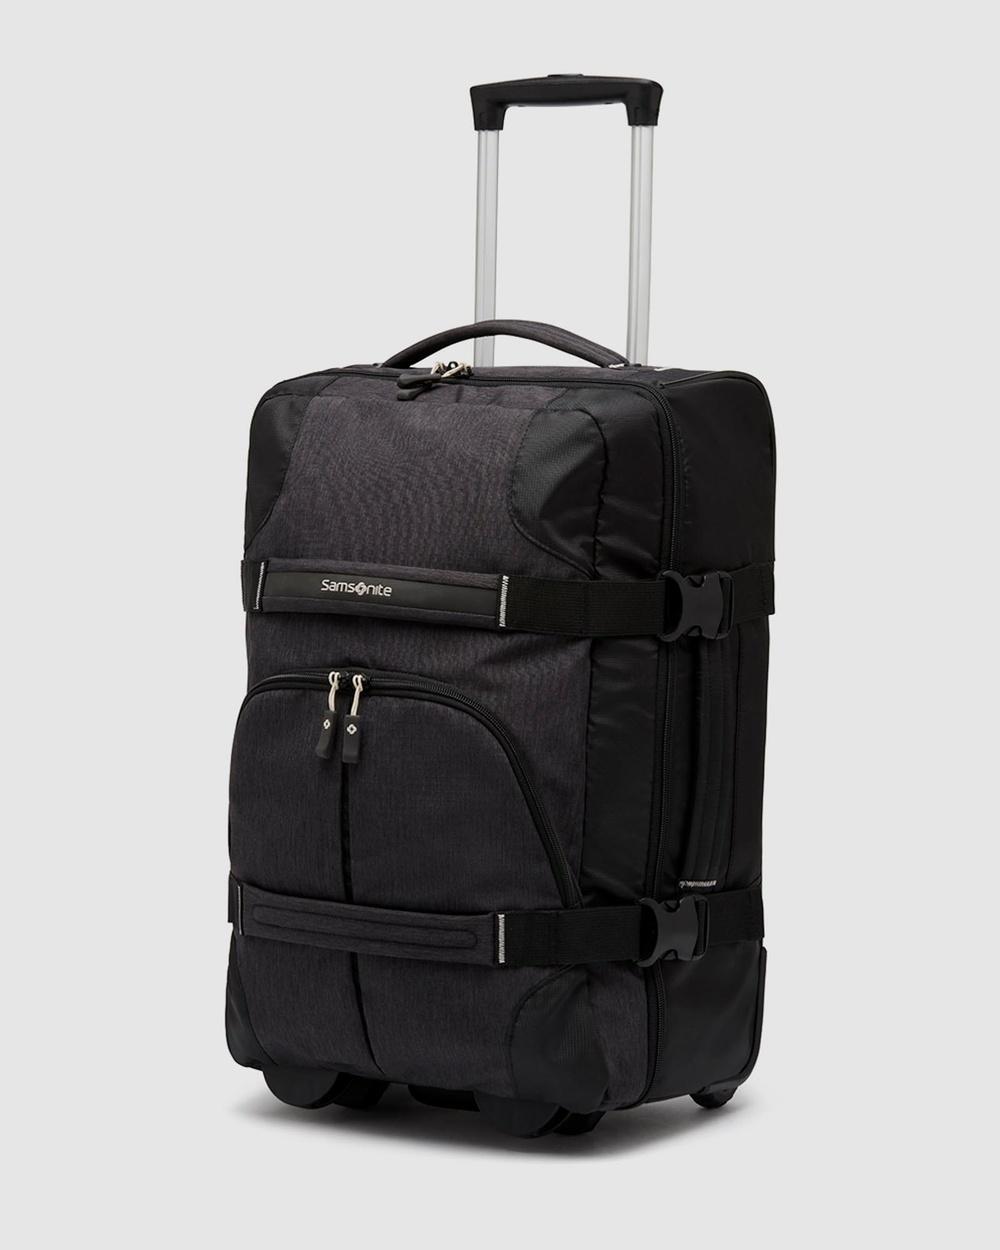 Samsonite Rewind Duffle Wheeled 55cm Bags Black